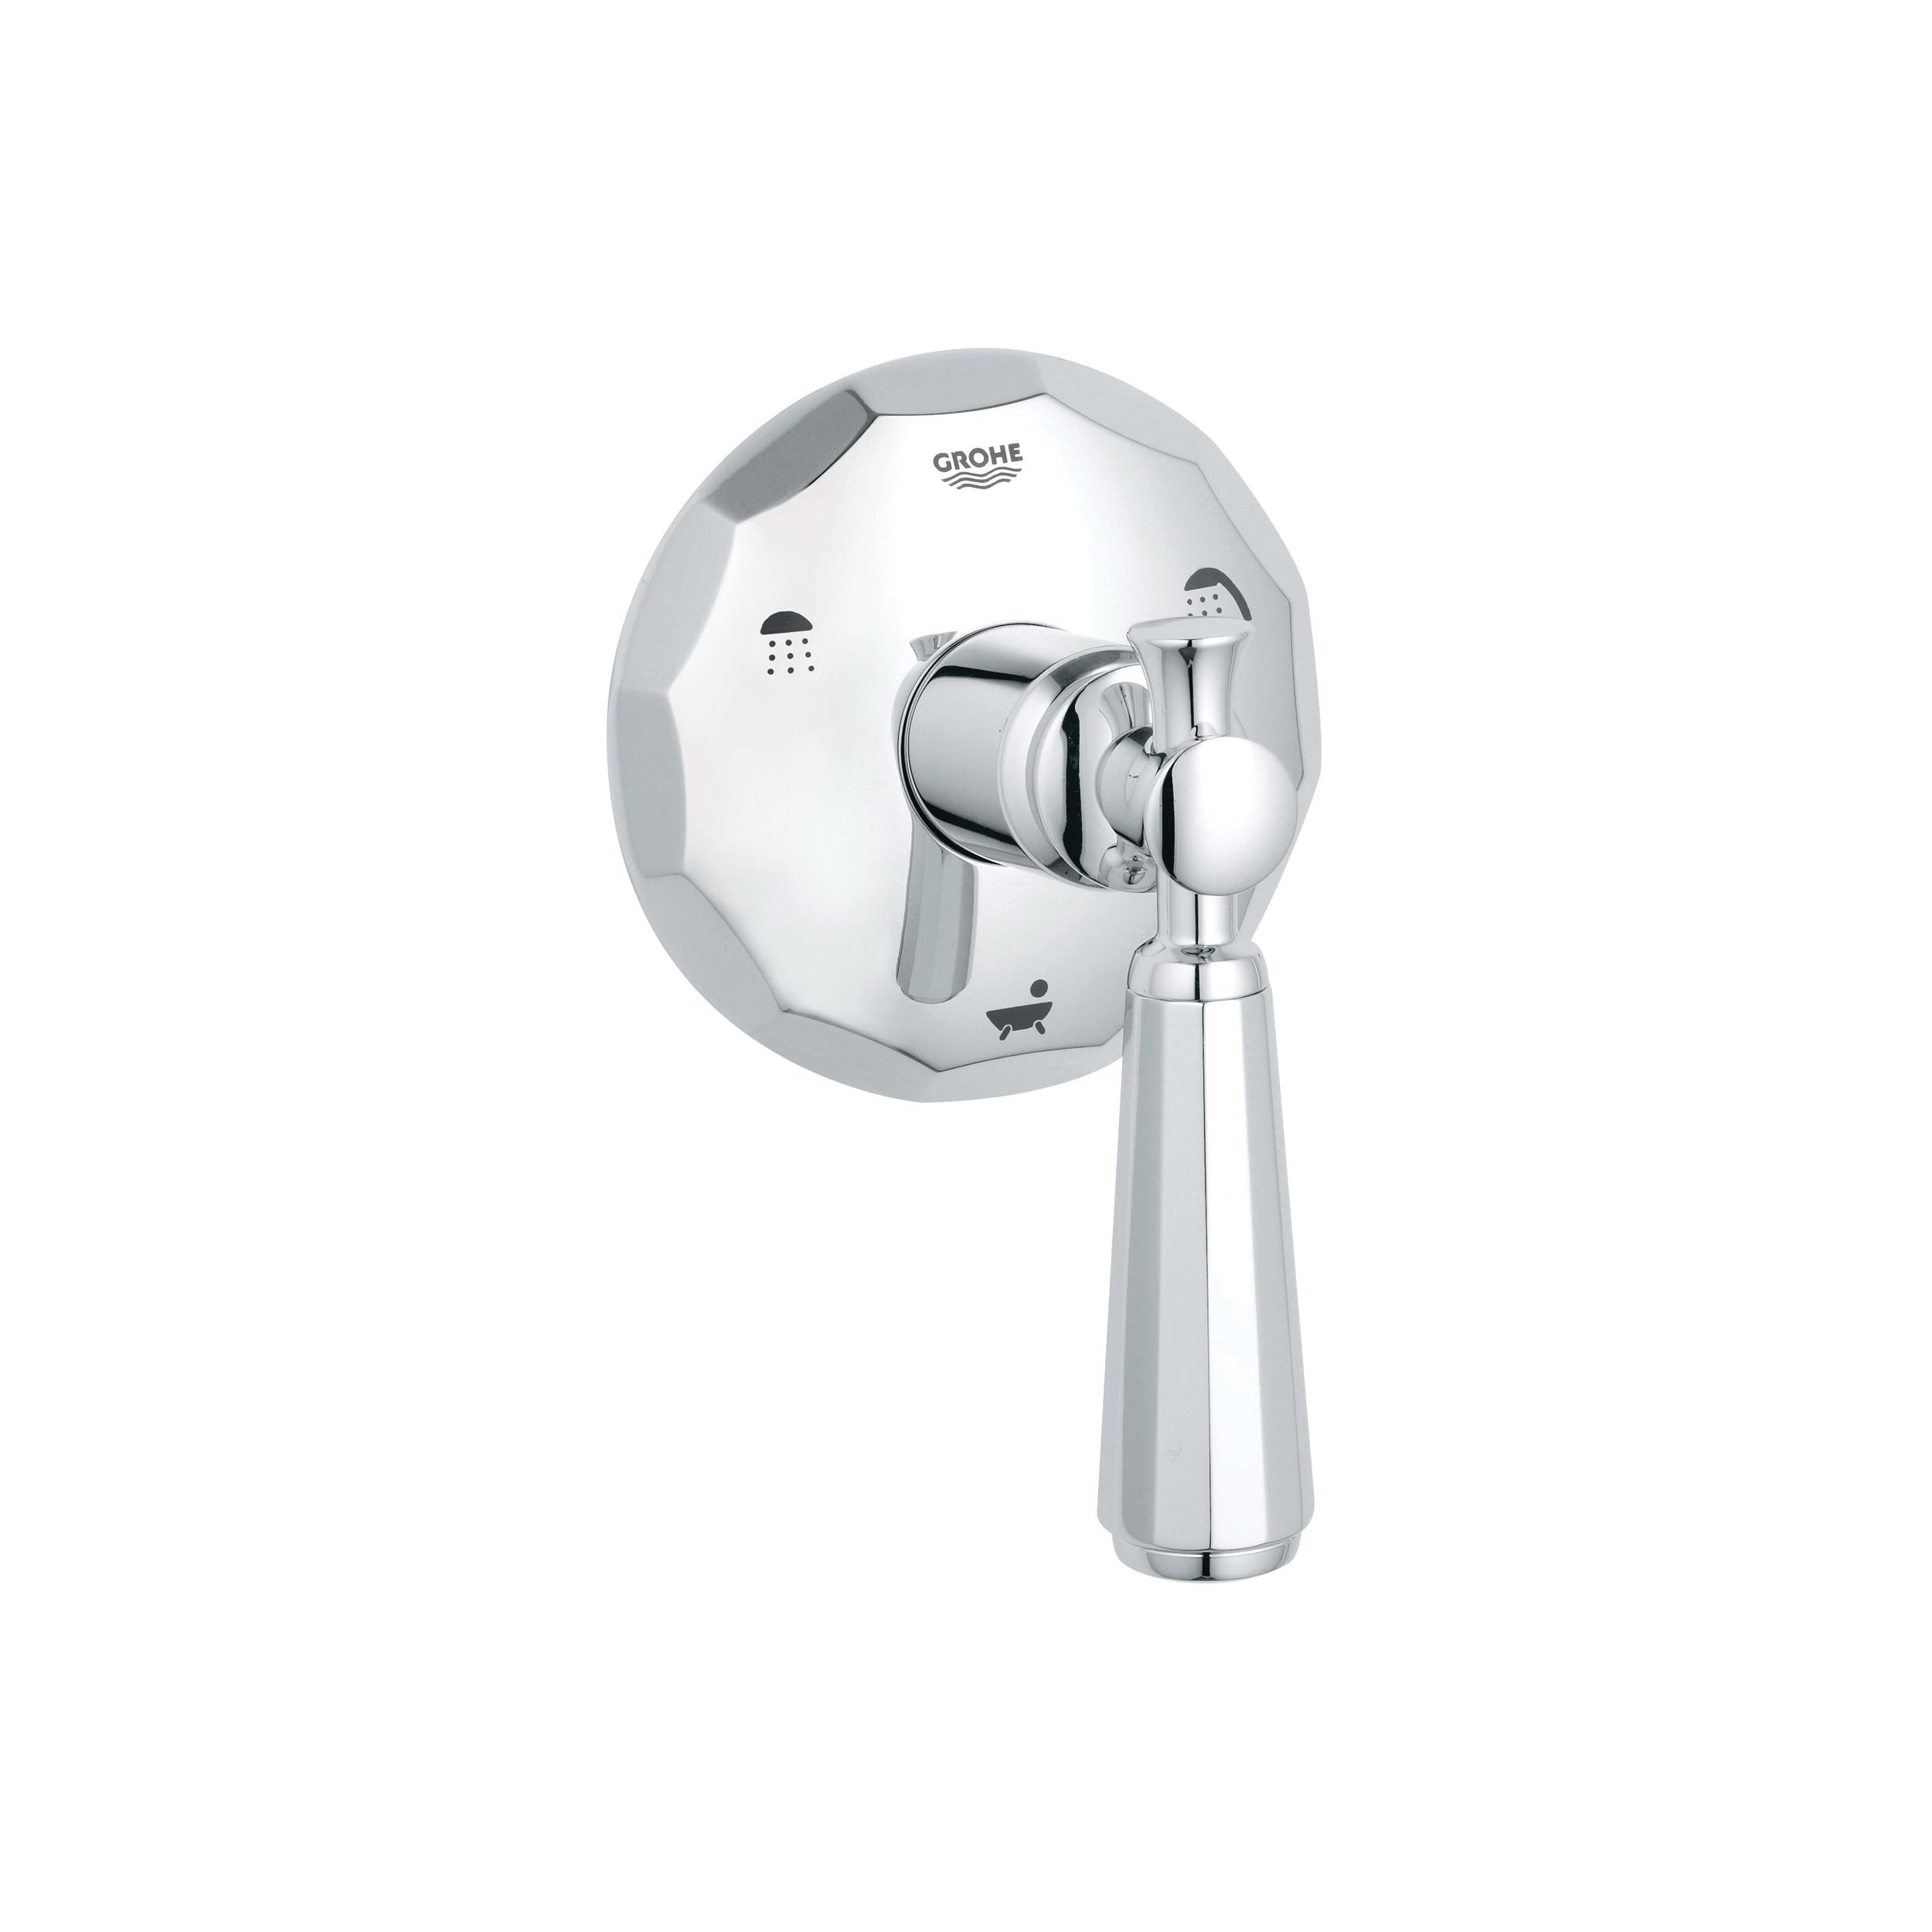 GROHE 19272000 Kensington® 3-Way Diverter, StarLight® Chrome Plated